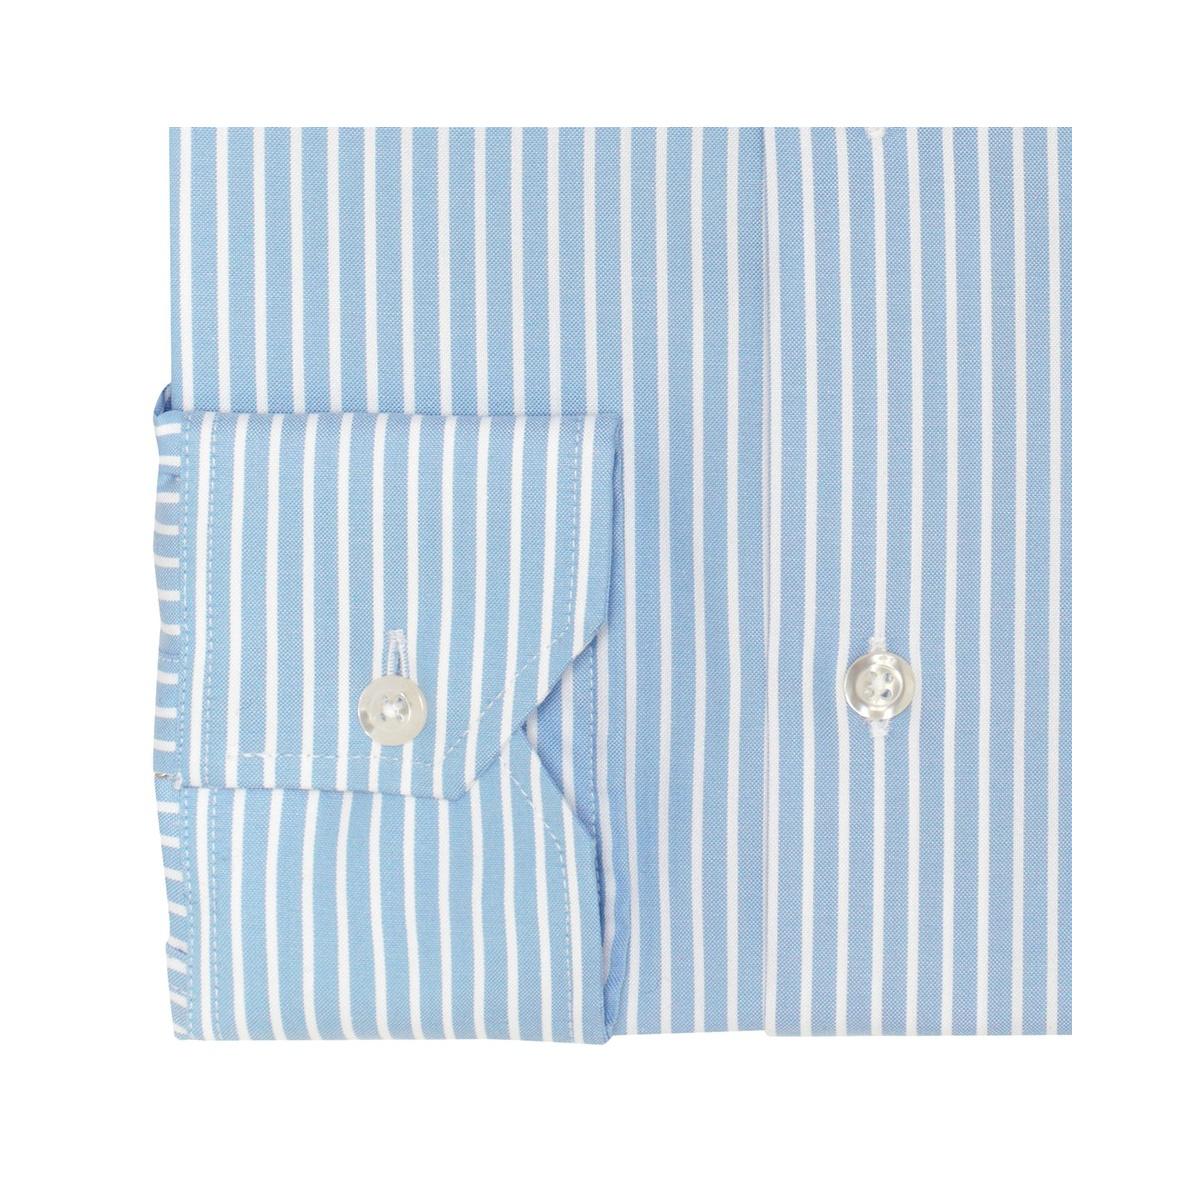 e43d703fbe Light-blue Shirt whit white stripe - 100% cotton - double twist oxford